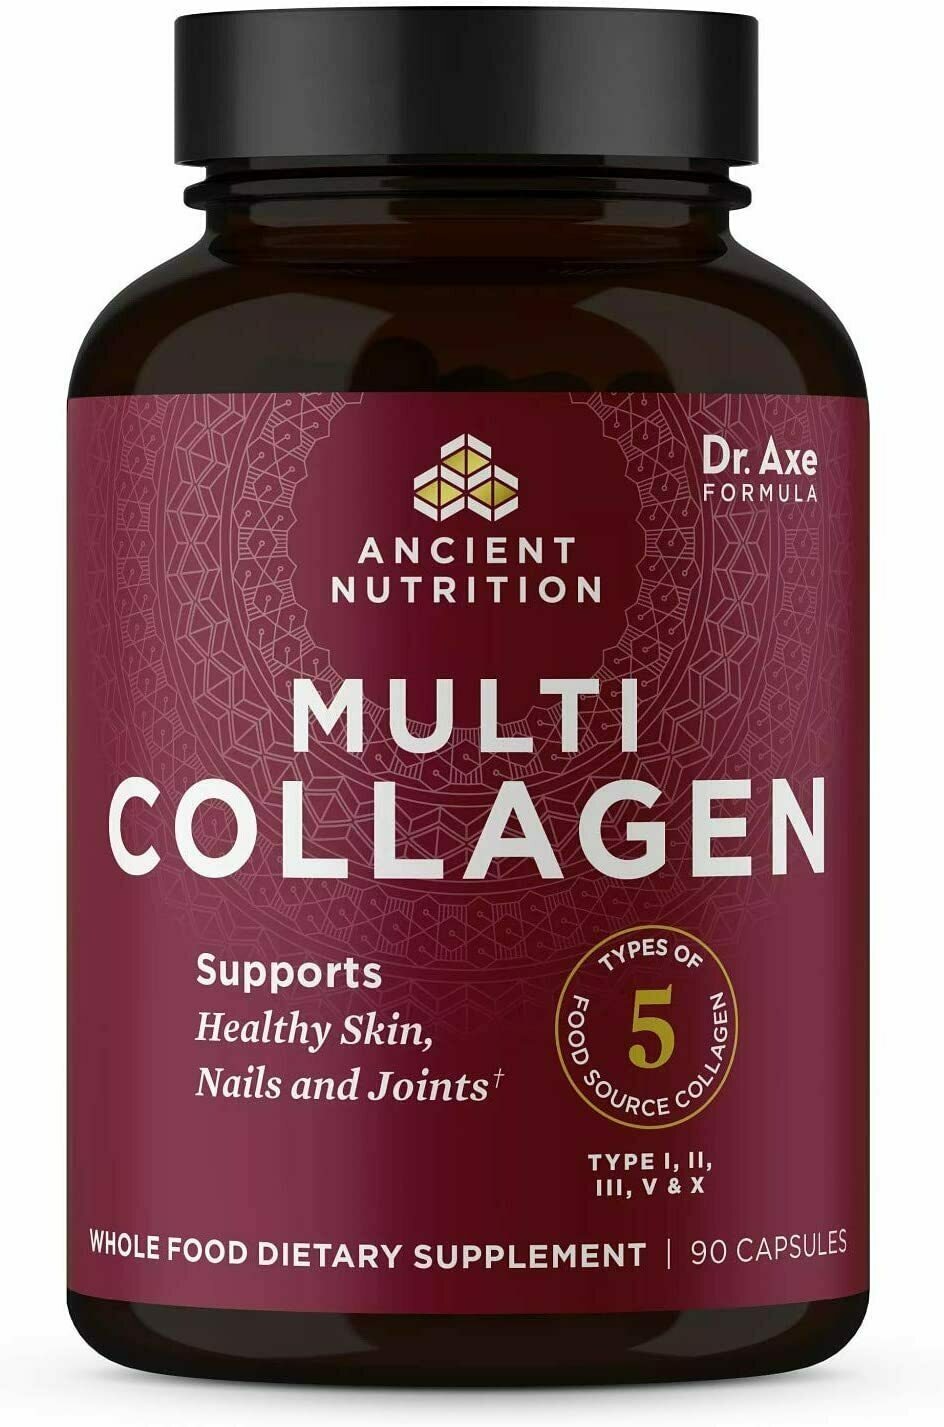 Ancient Nutrition Collagen